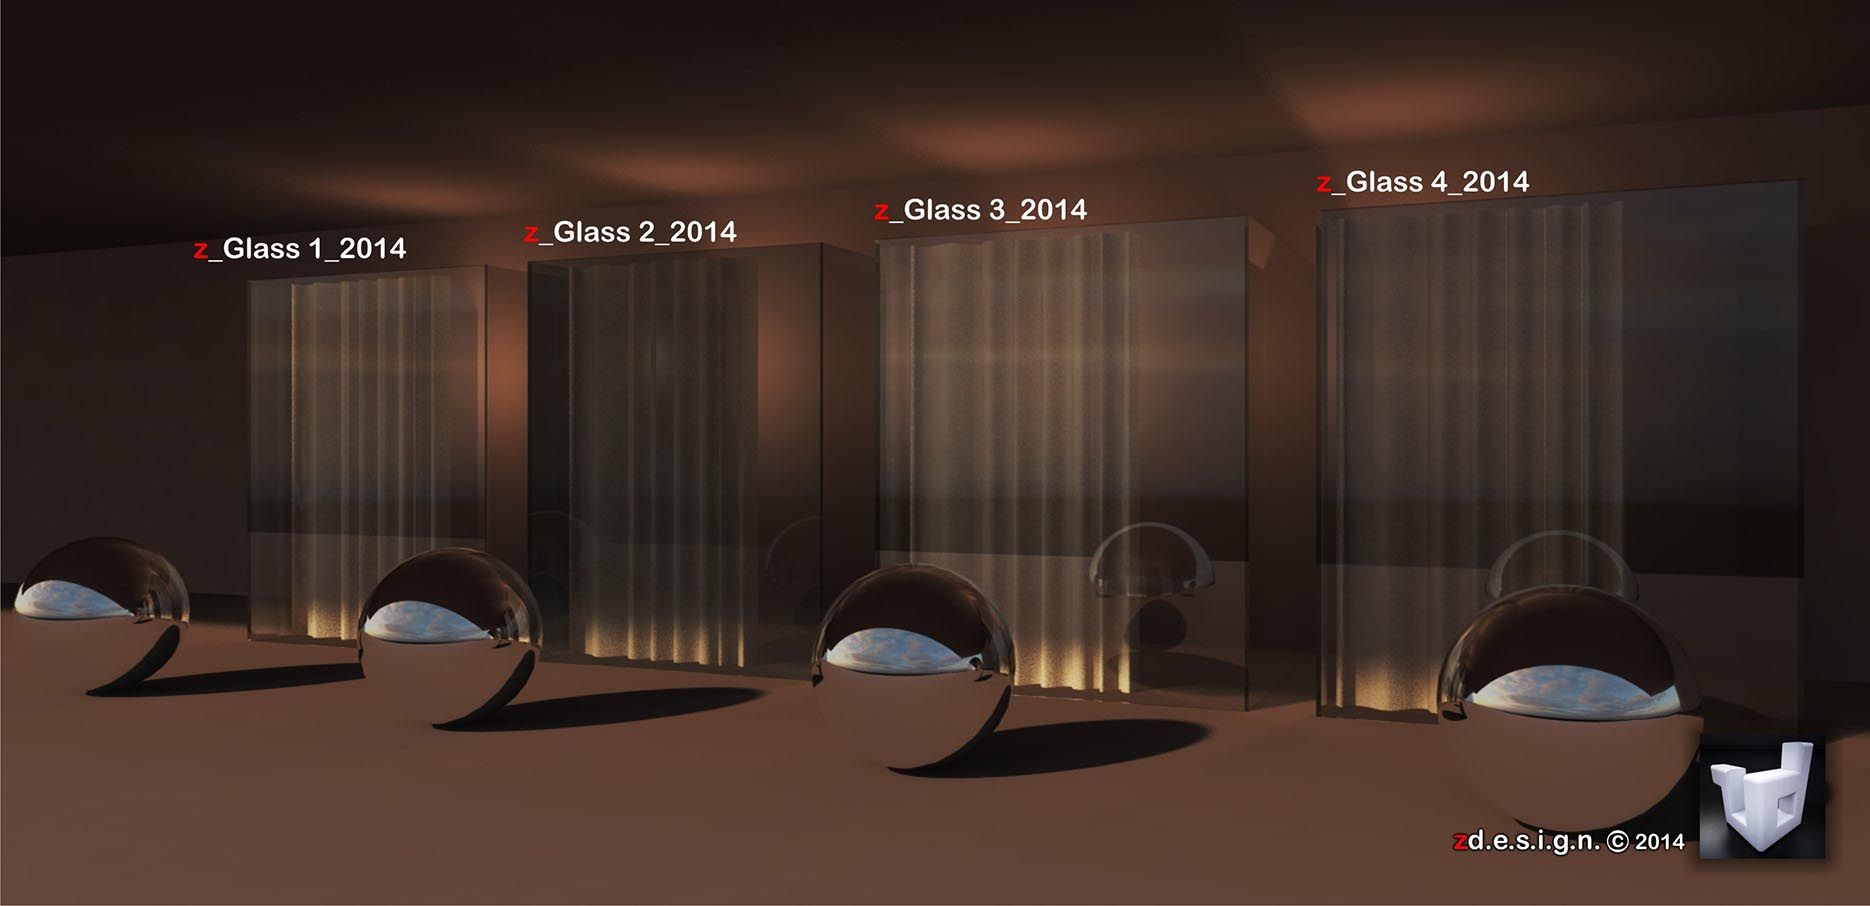 zdesign: Glass Vismat & Omni Lights Shadow setting       skp vray 2